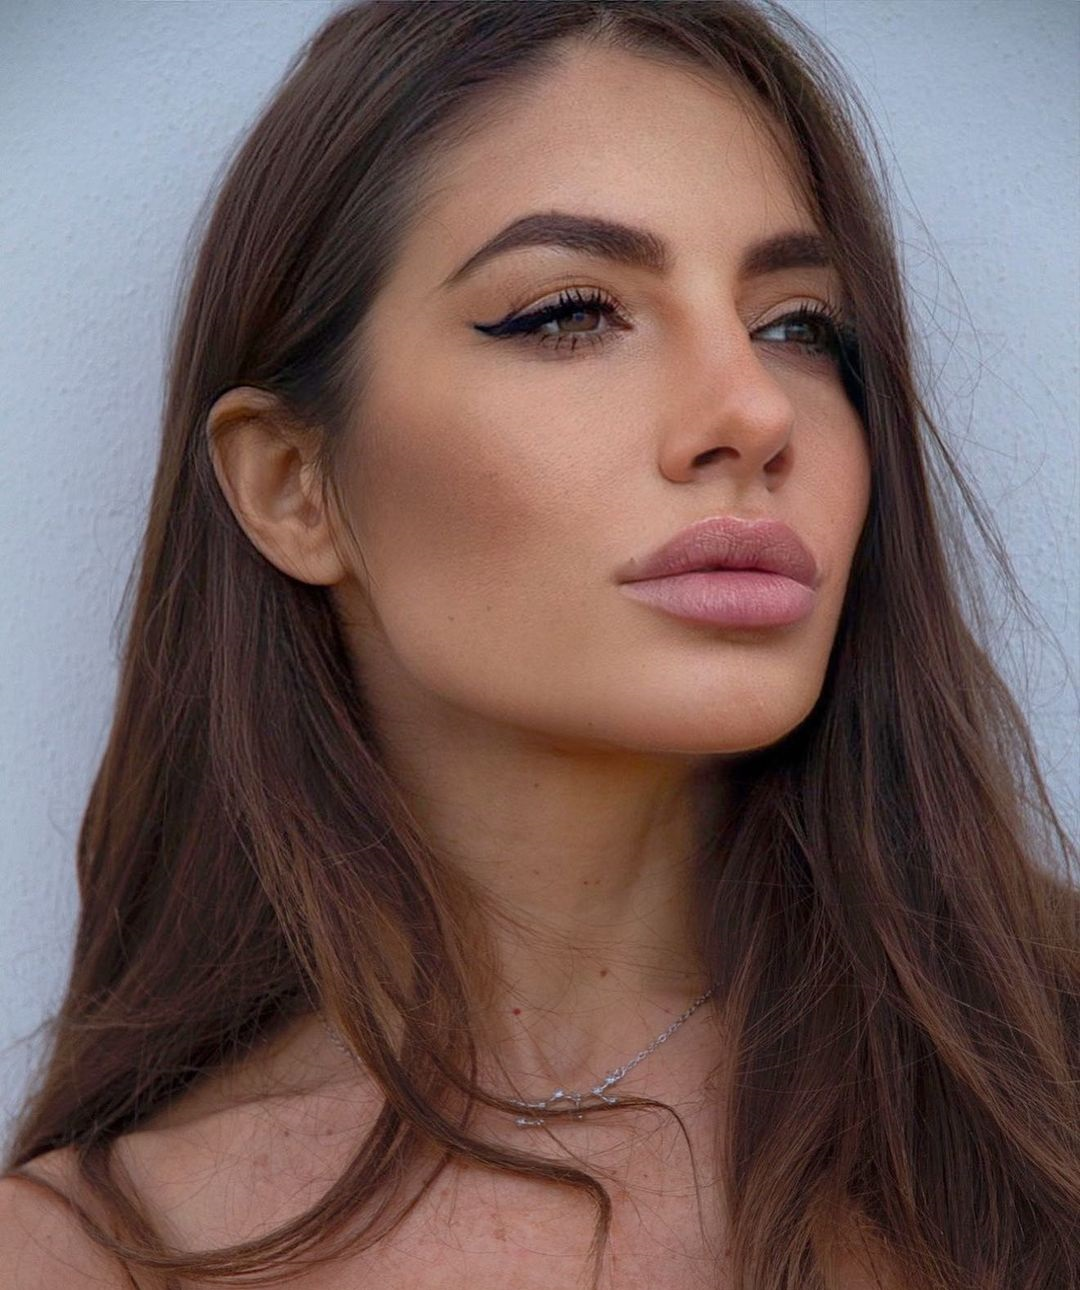 Ludovica-Genovesi-Wallpapers-Insta-Fit-Bio-13